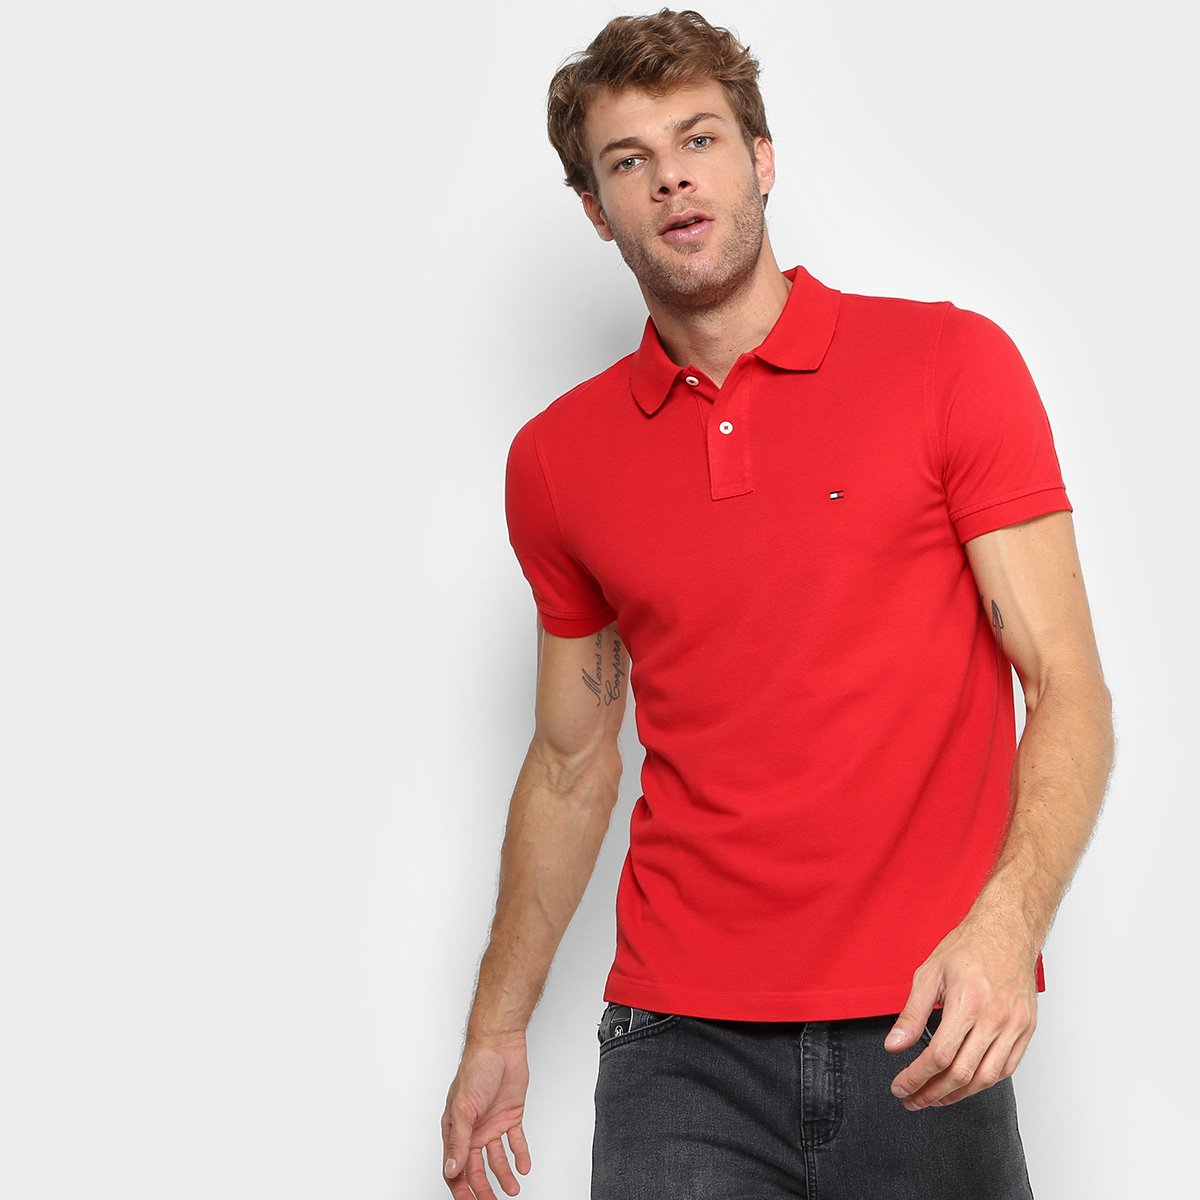 1c88394726 Camisa Polo Tommy Hilfiger Slim Fit Clássica Masculina